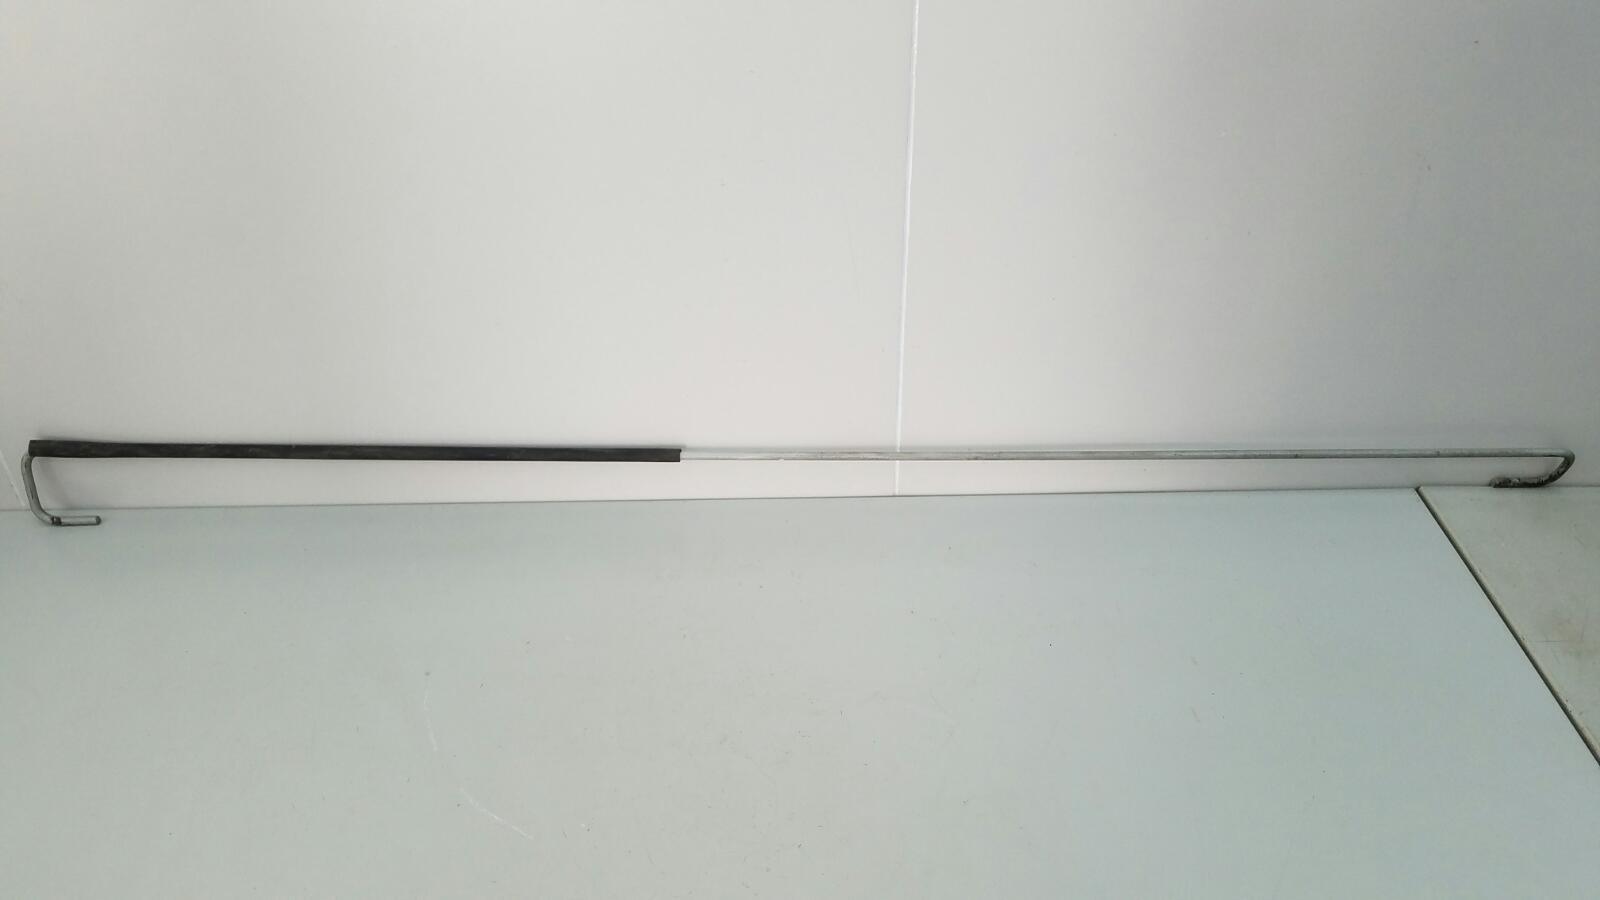 Торсион крышки багажника Daewoo Leganza C20SED 2.0Л 1998